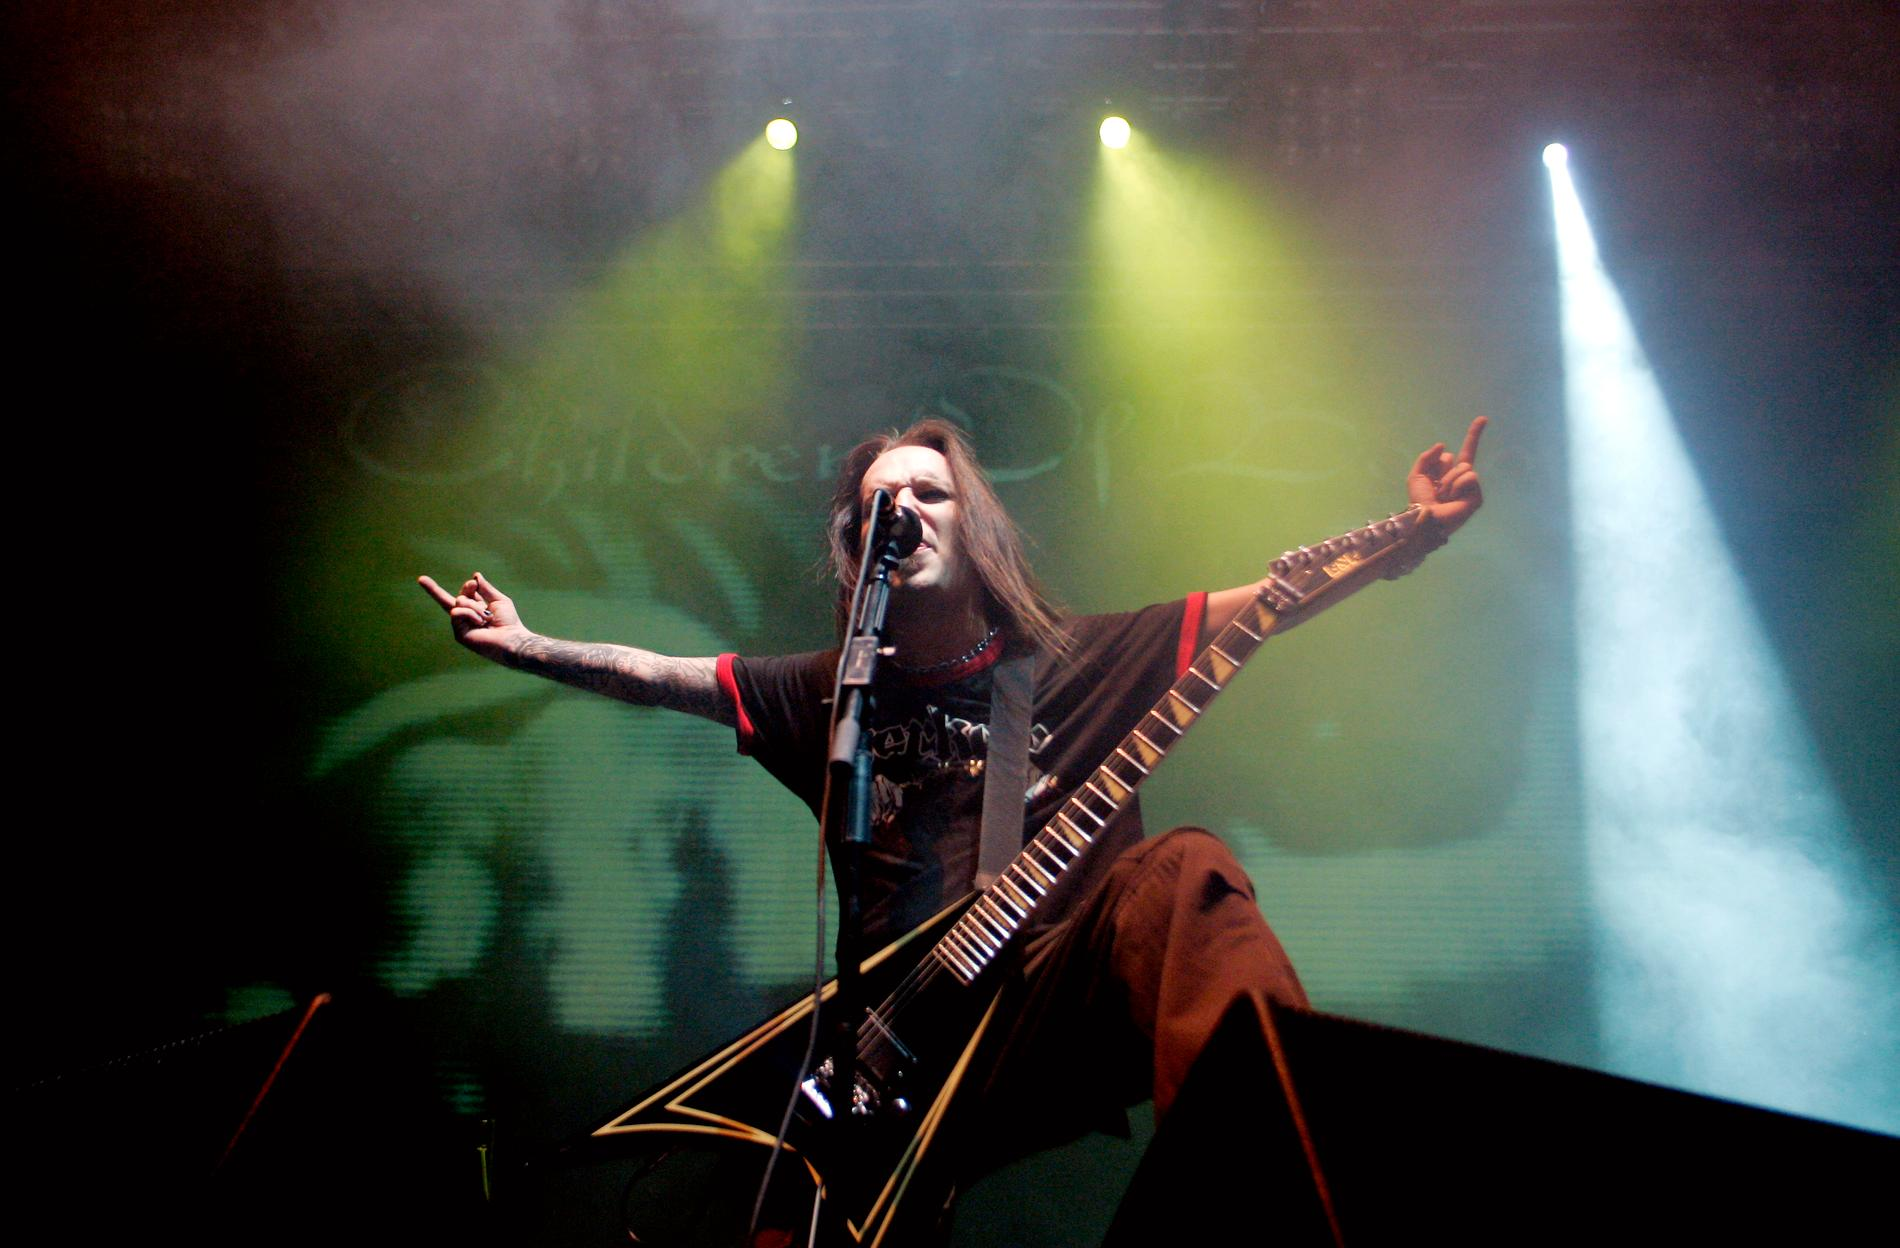 Alexi Laiho på scen med Children Of Bodom i Oslo den 15 november 2006, under den då pågående Unholy Alliance-turnén tillsammans med bland andra Slayer och Lamb Of God.